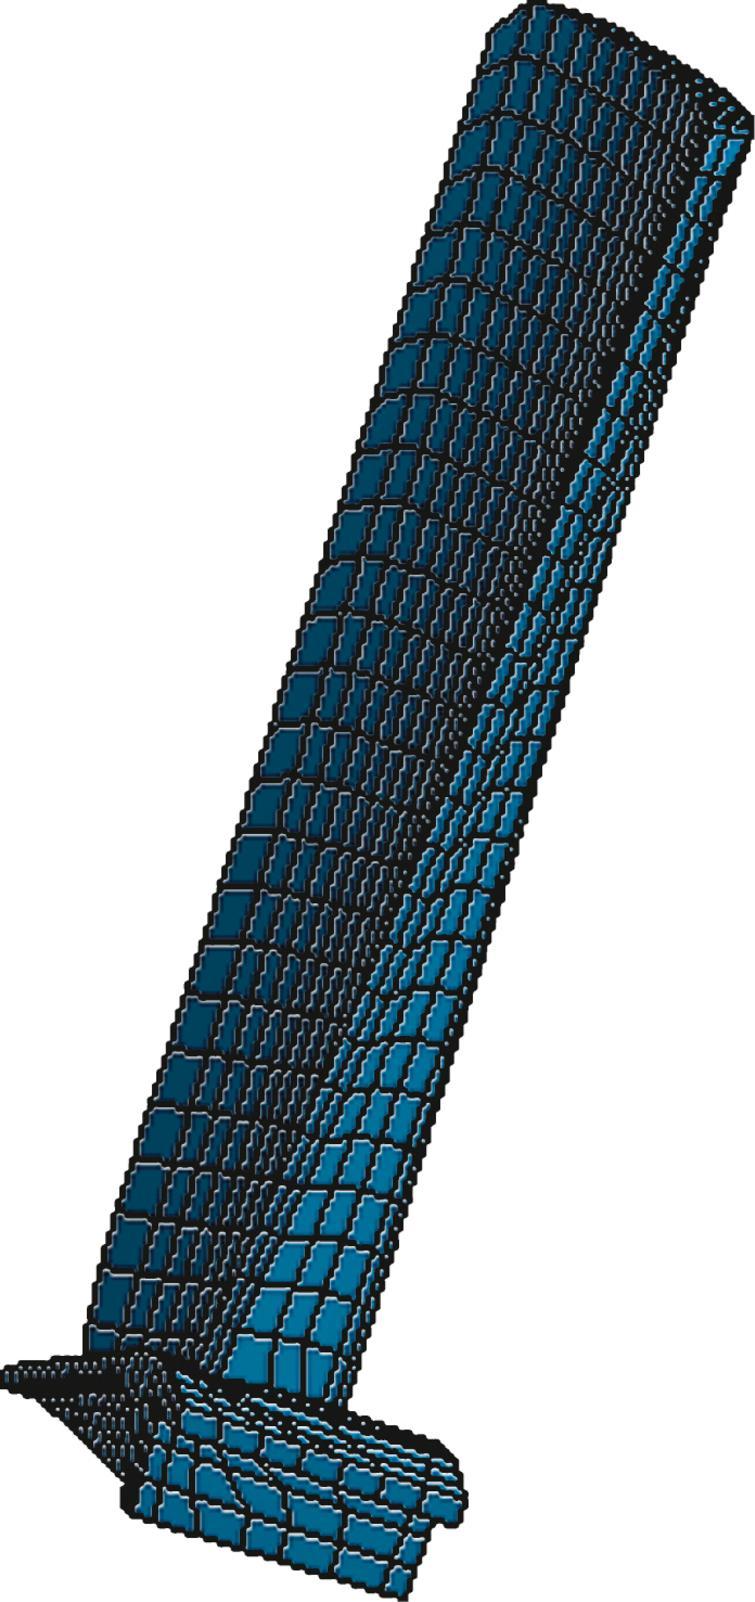 Aero-engine blade finite element model.